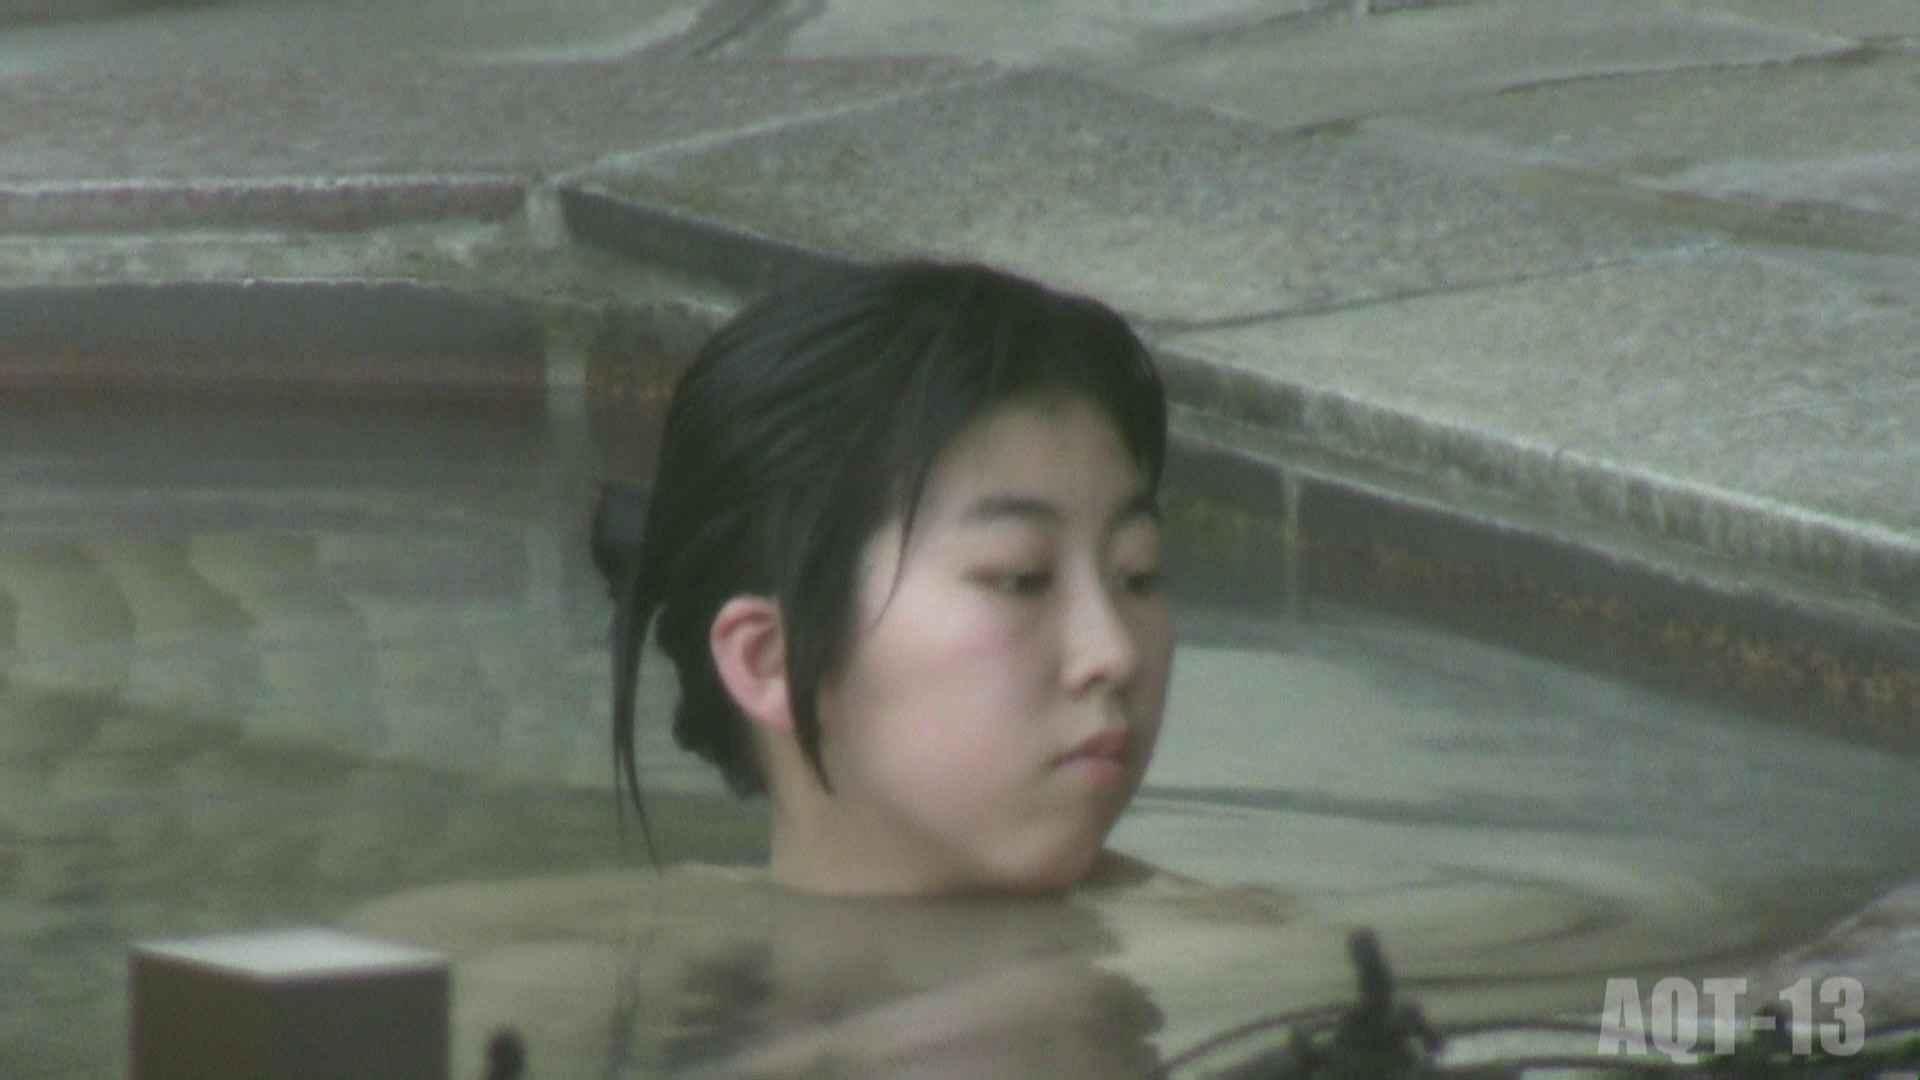 Aquaな露天風呂Vol.816 OLセックス  80画像 36